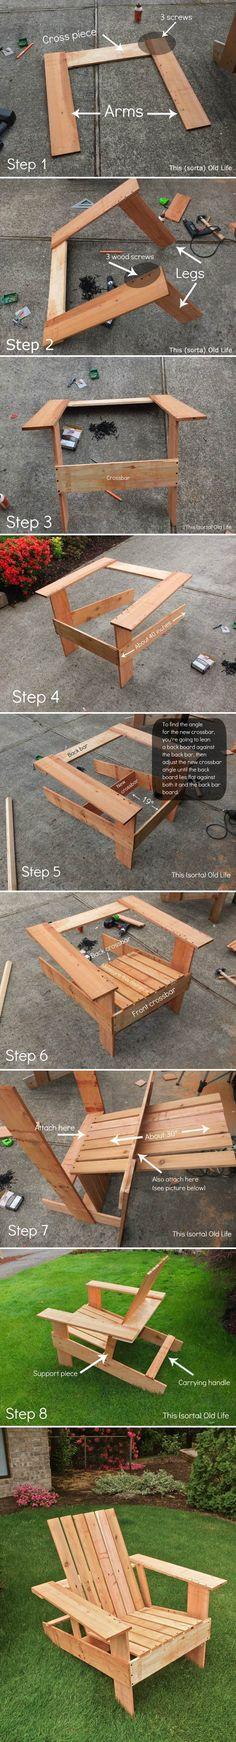 DIY Adirondack Chair - Thehomesteadingboards.com